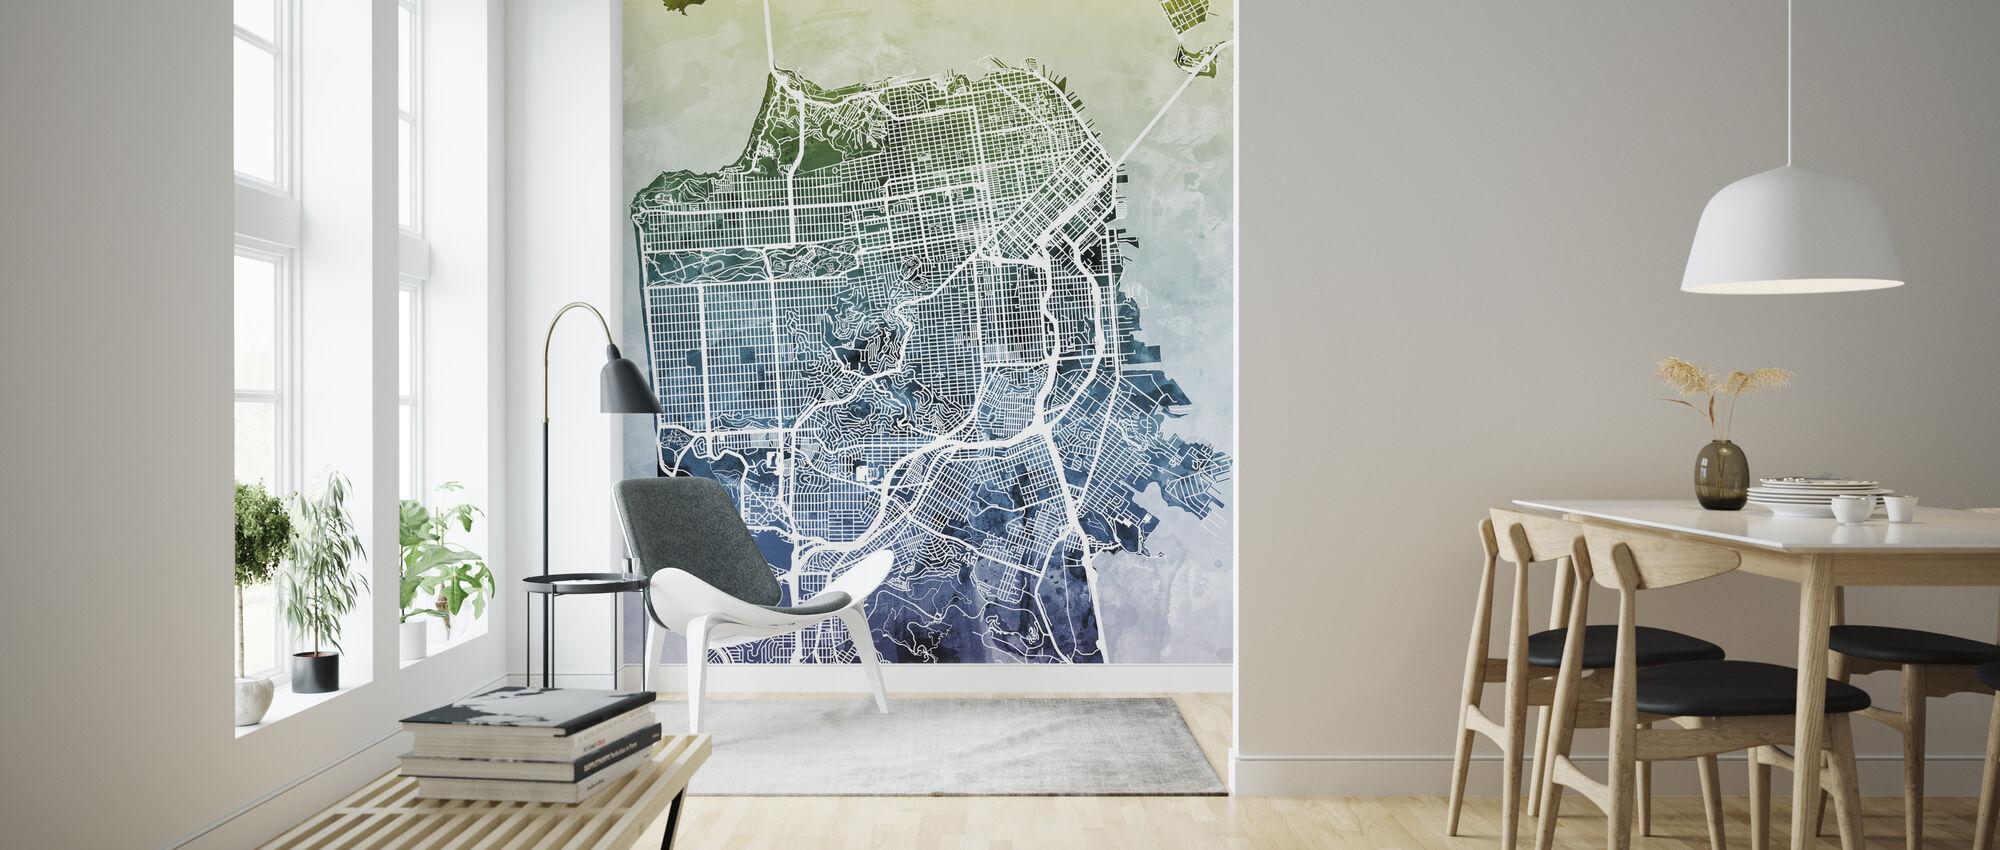 San Fransisco Street Map Bluegreen - Wallpaper - Living Room